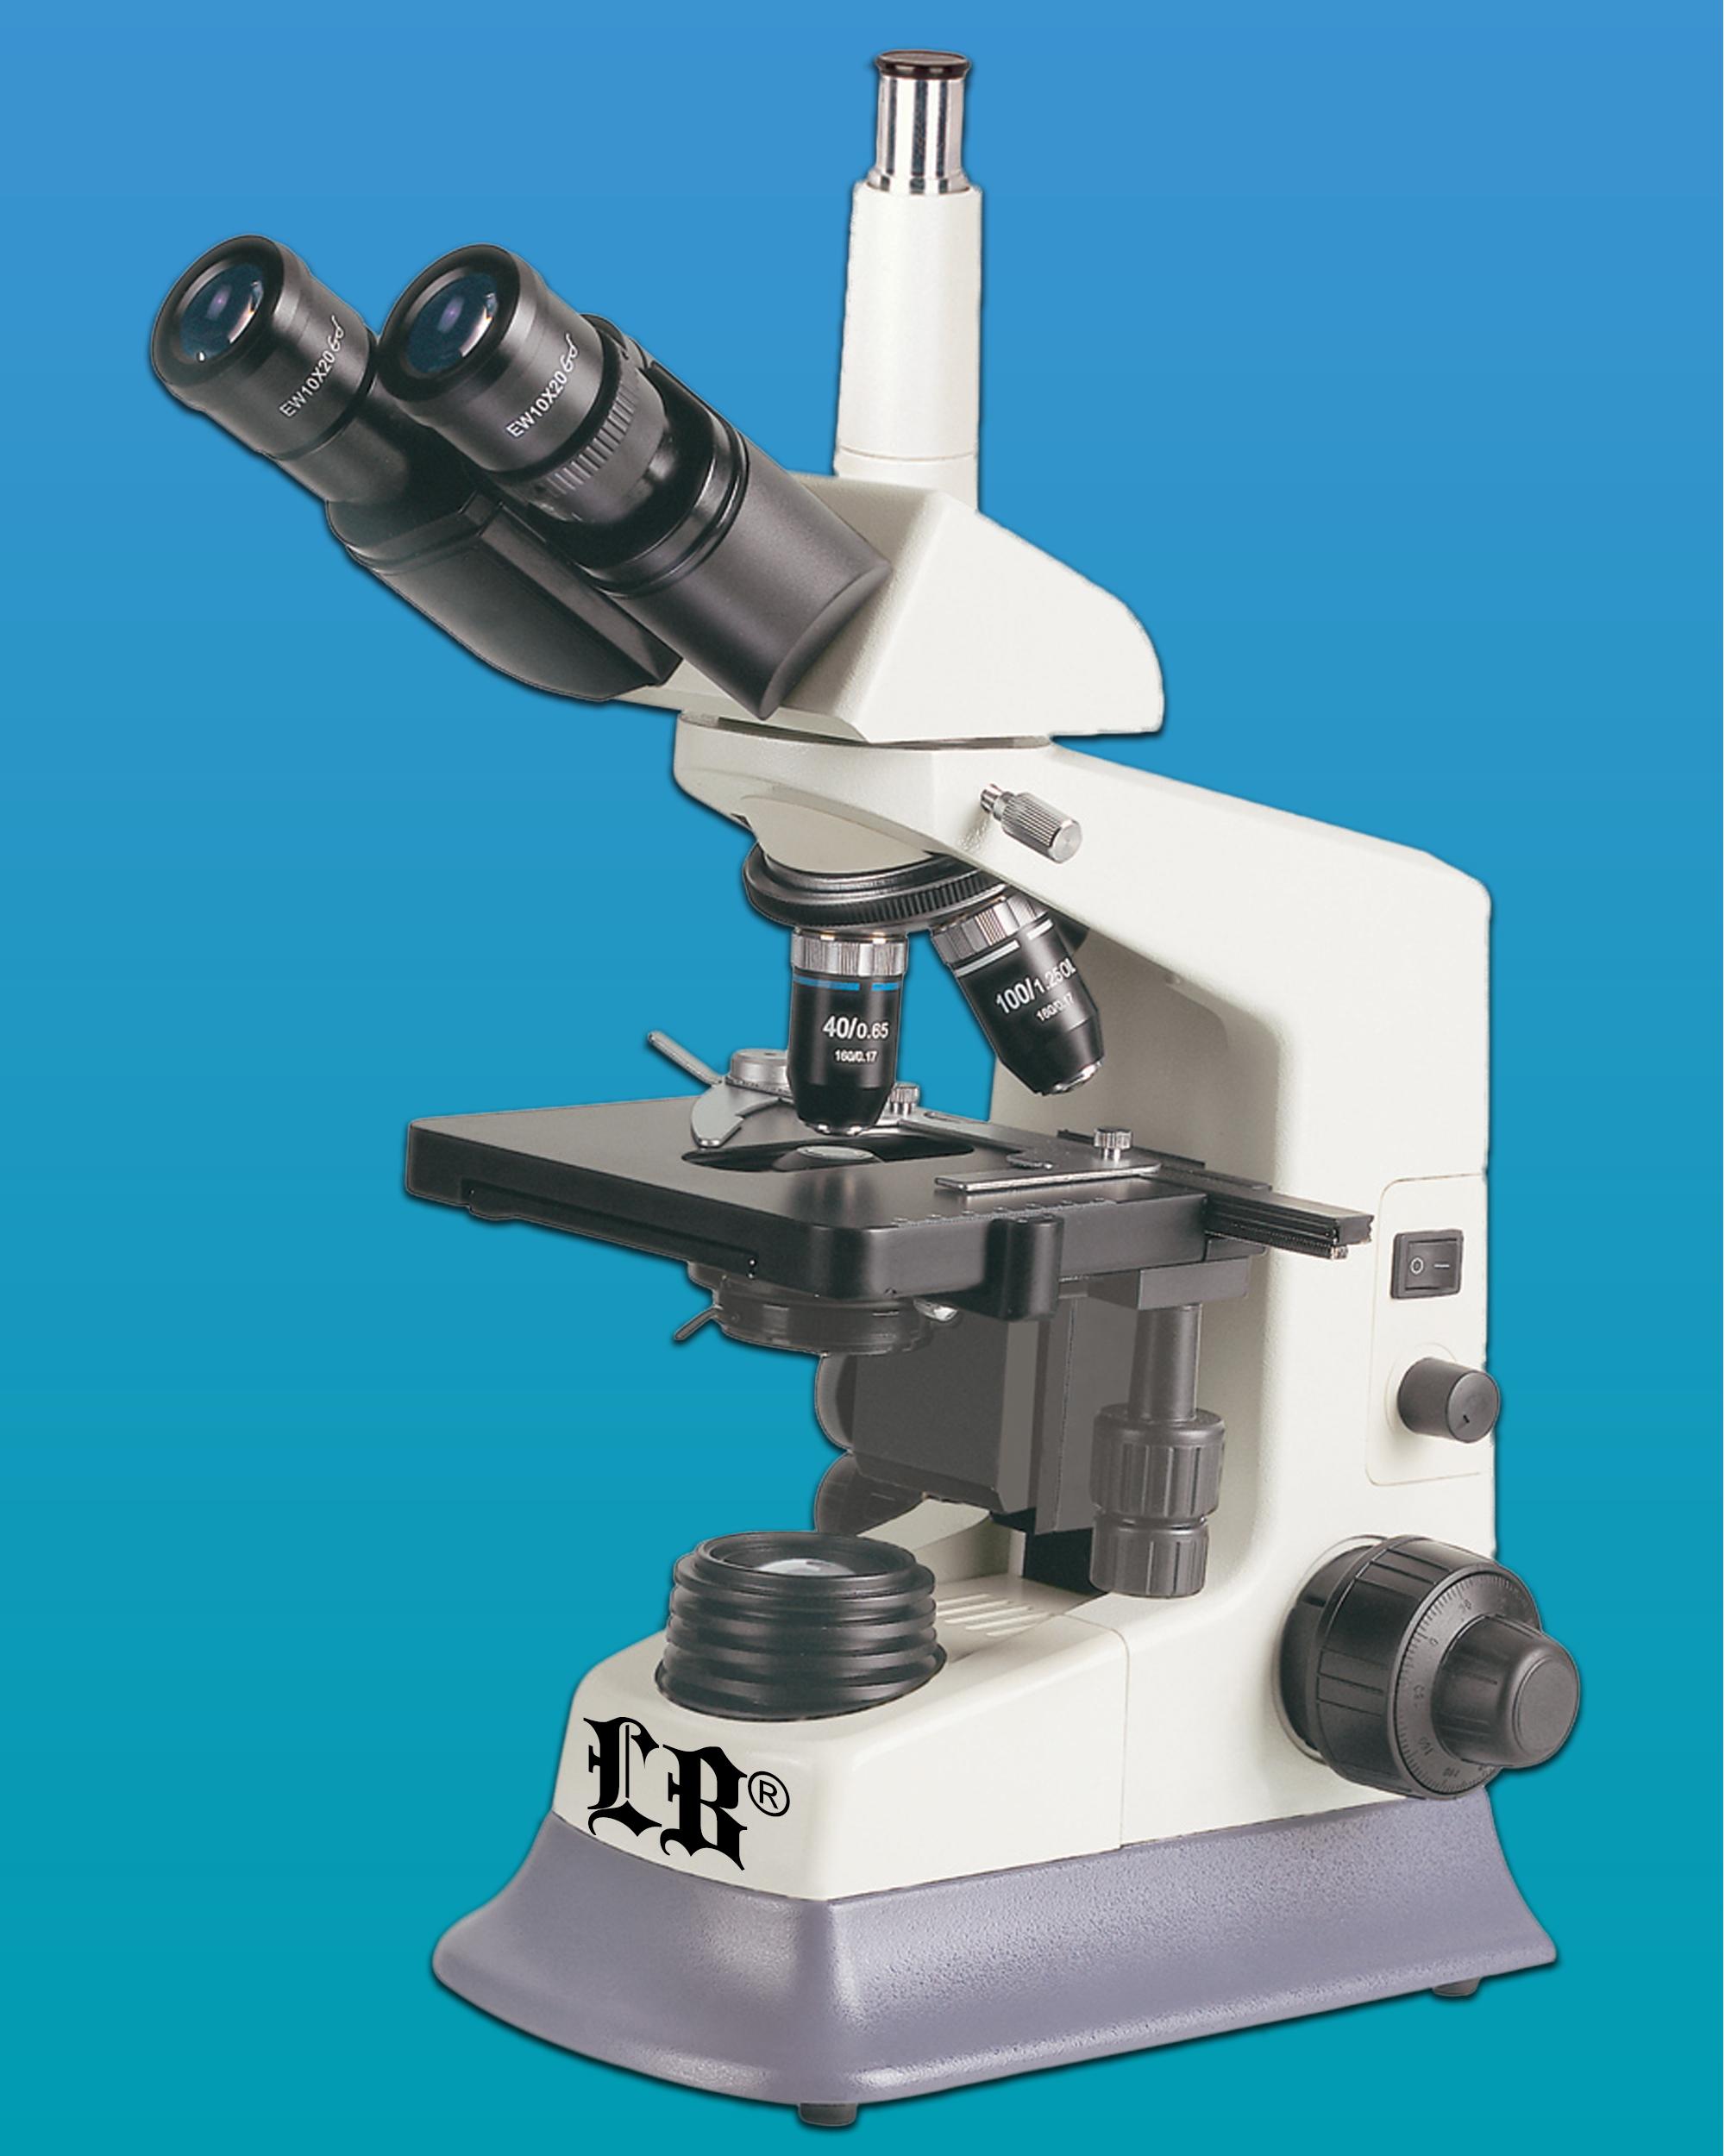 [LB-255] Trinocular Seidentopf Bio Microscope w/ LED & 5 Semi-Plan Achromatic Objective Zoom